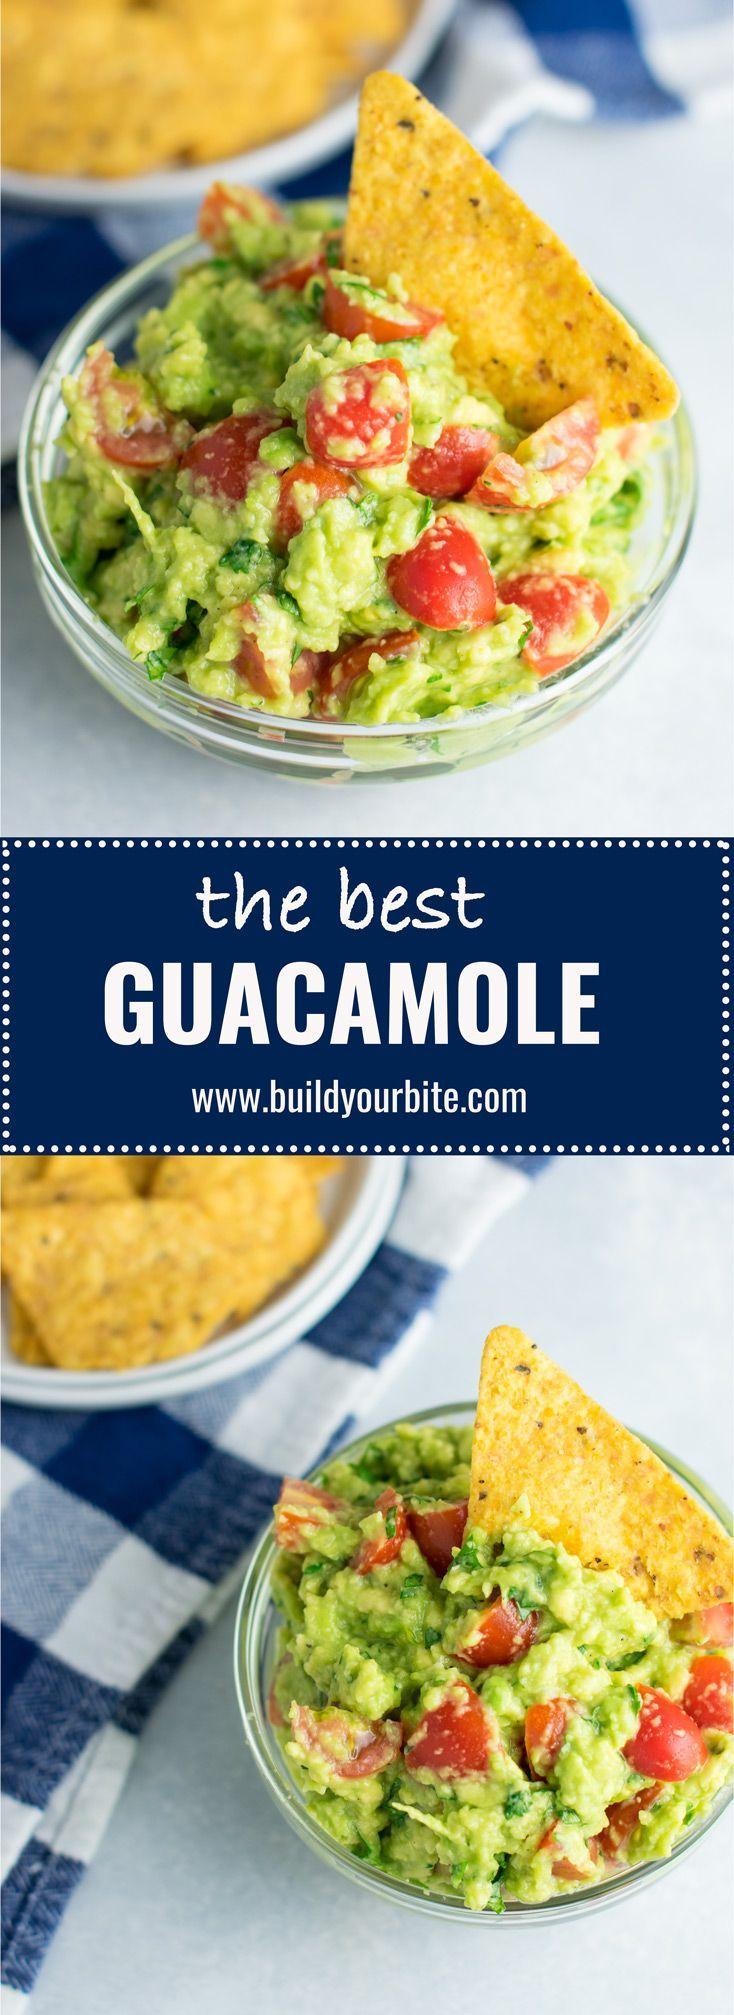 The best small batch guacamole recipe with cherry tomatoes. #vegan #guacamole #bestguacamole #appetizers #gamedayfood